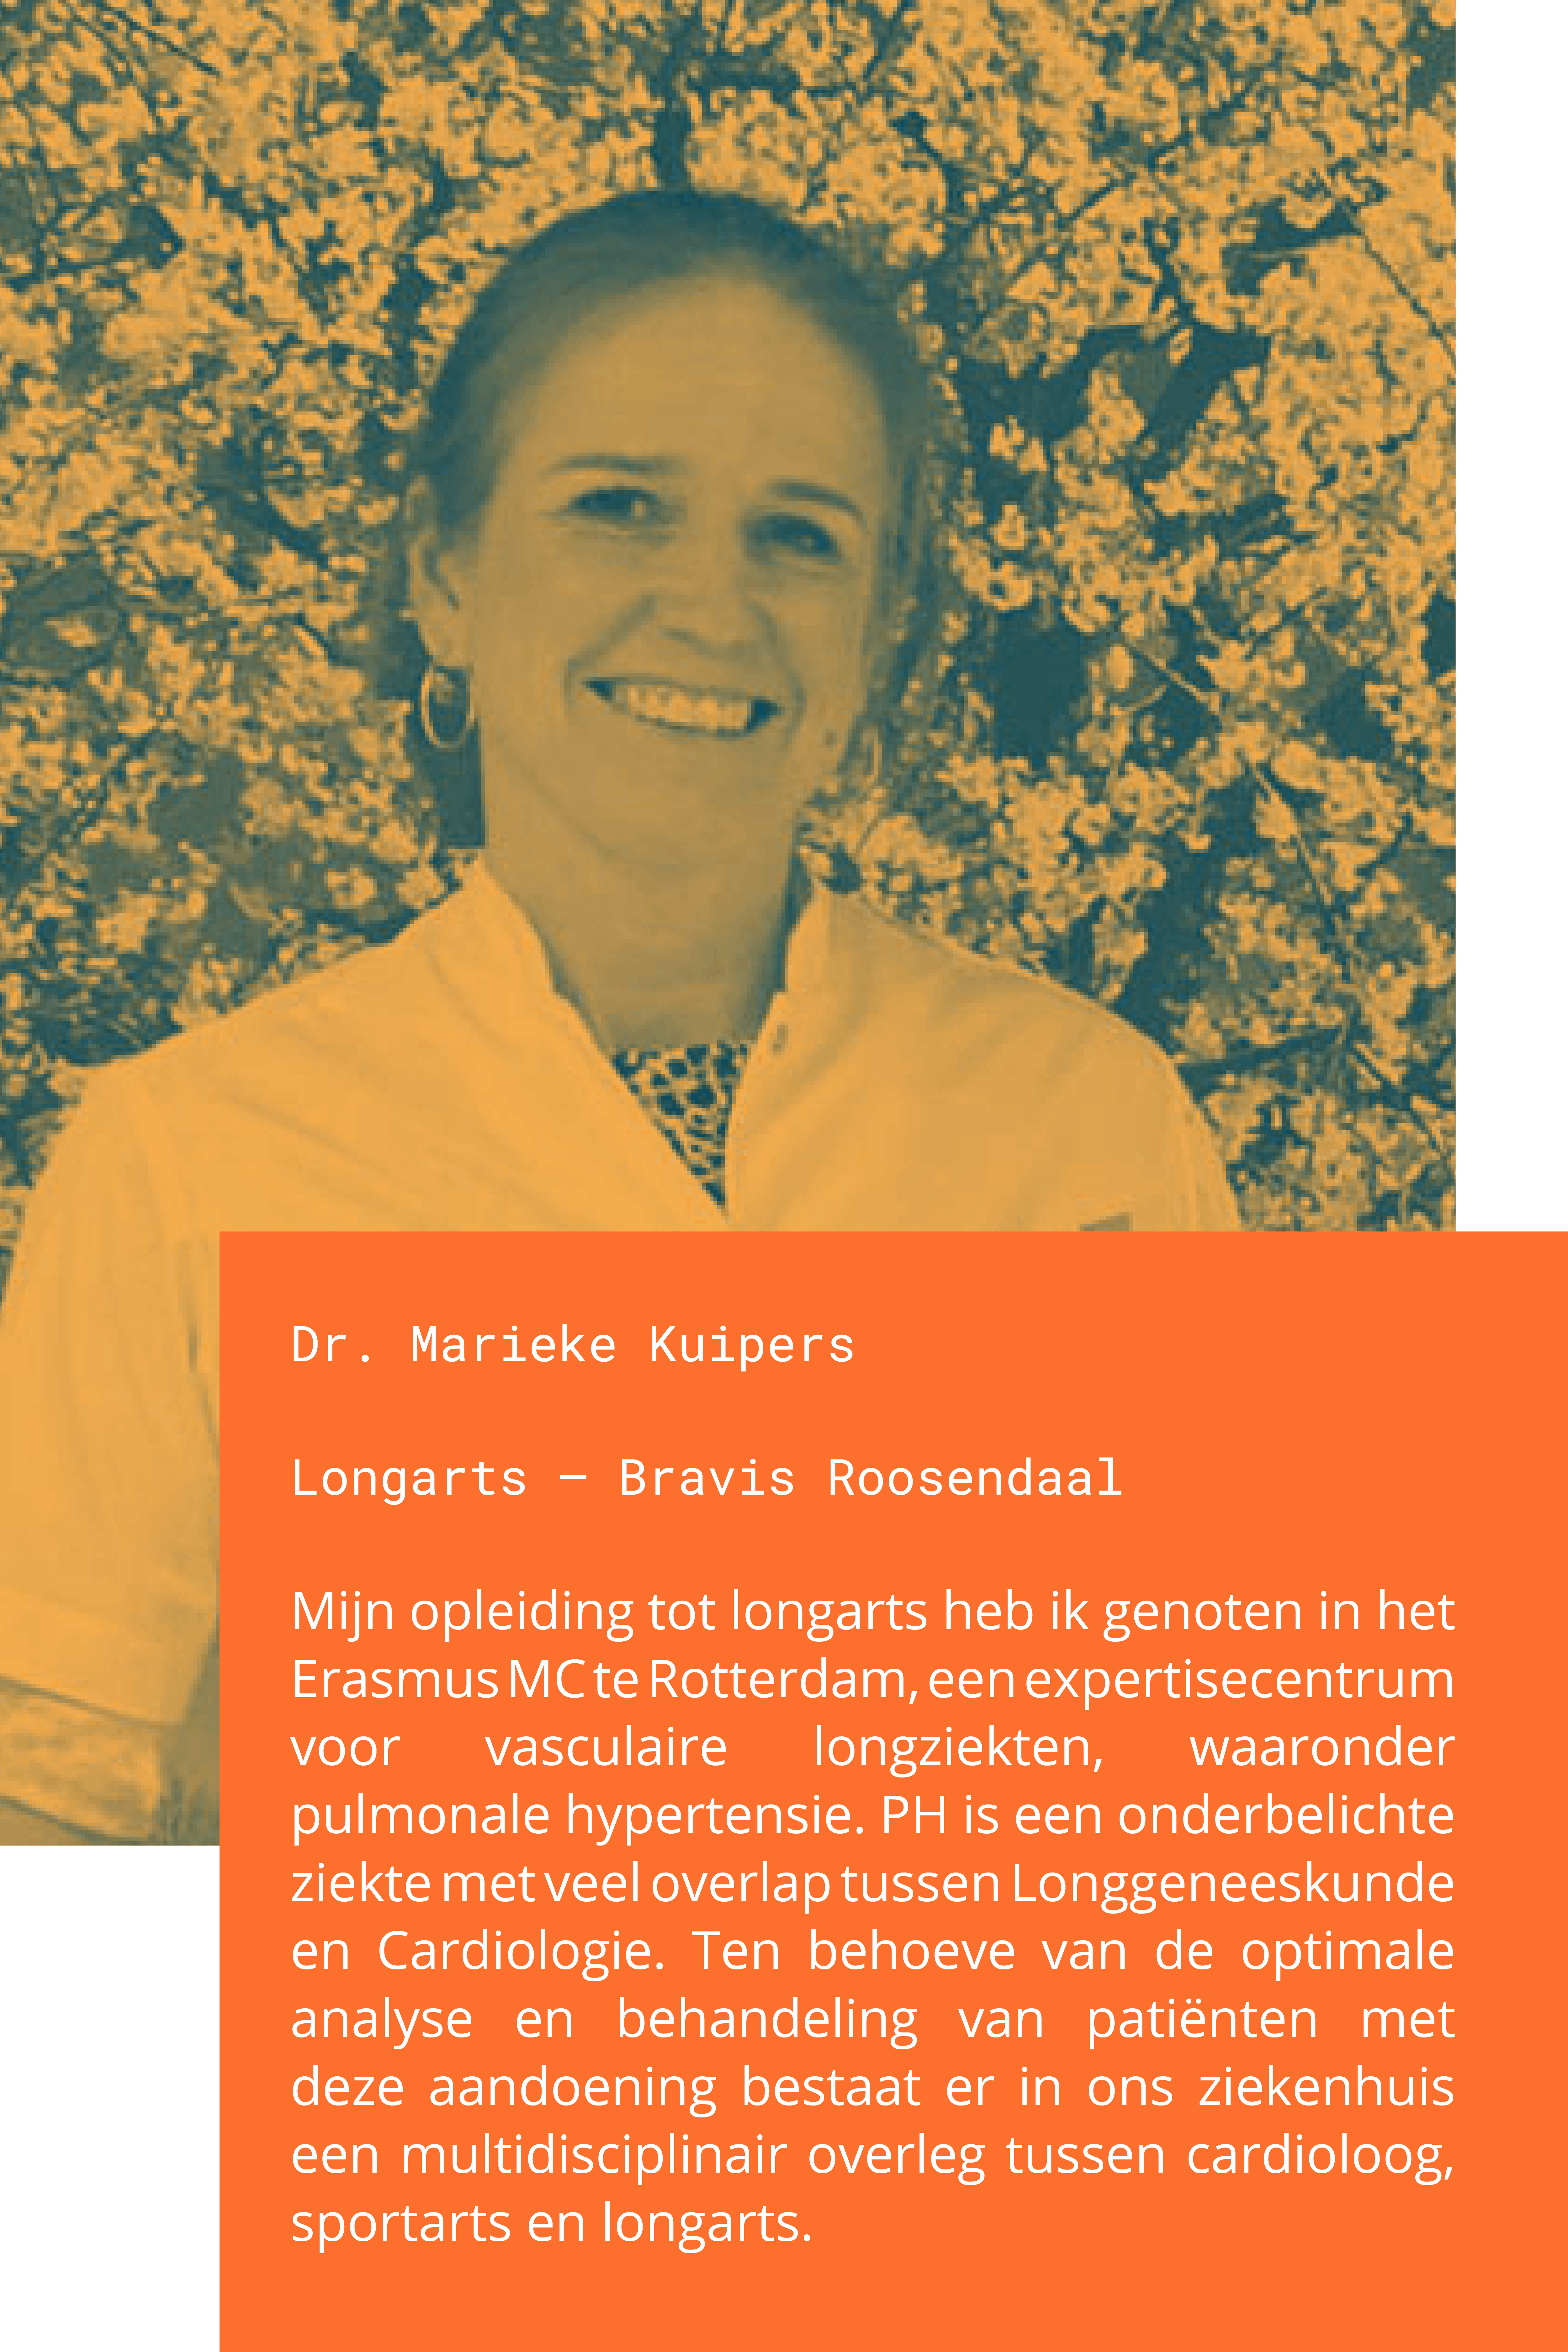 Adembenemend 2020 - Social - Marieke Kuipers (1)